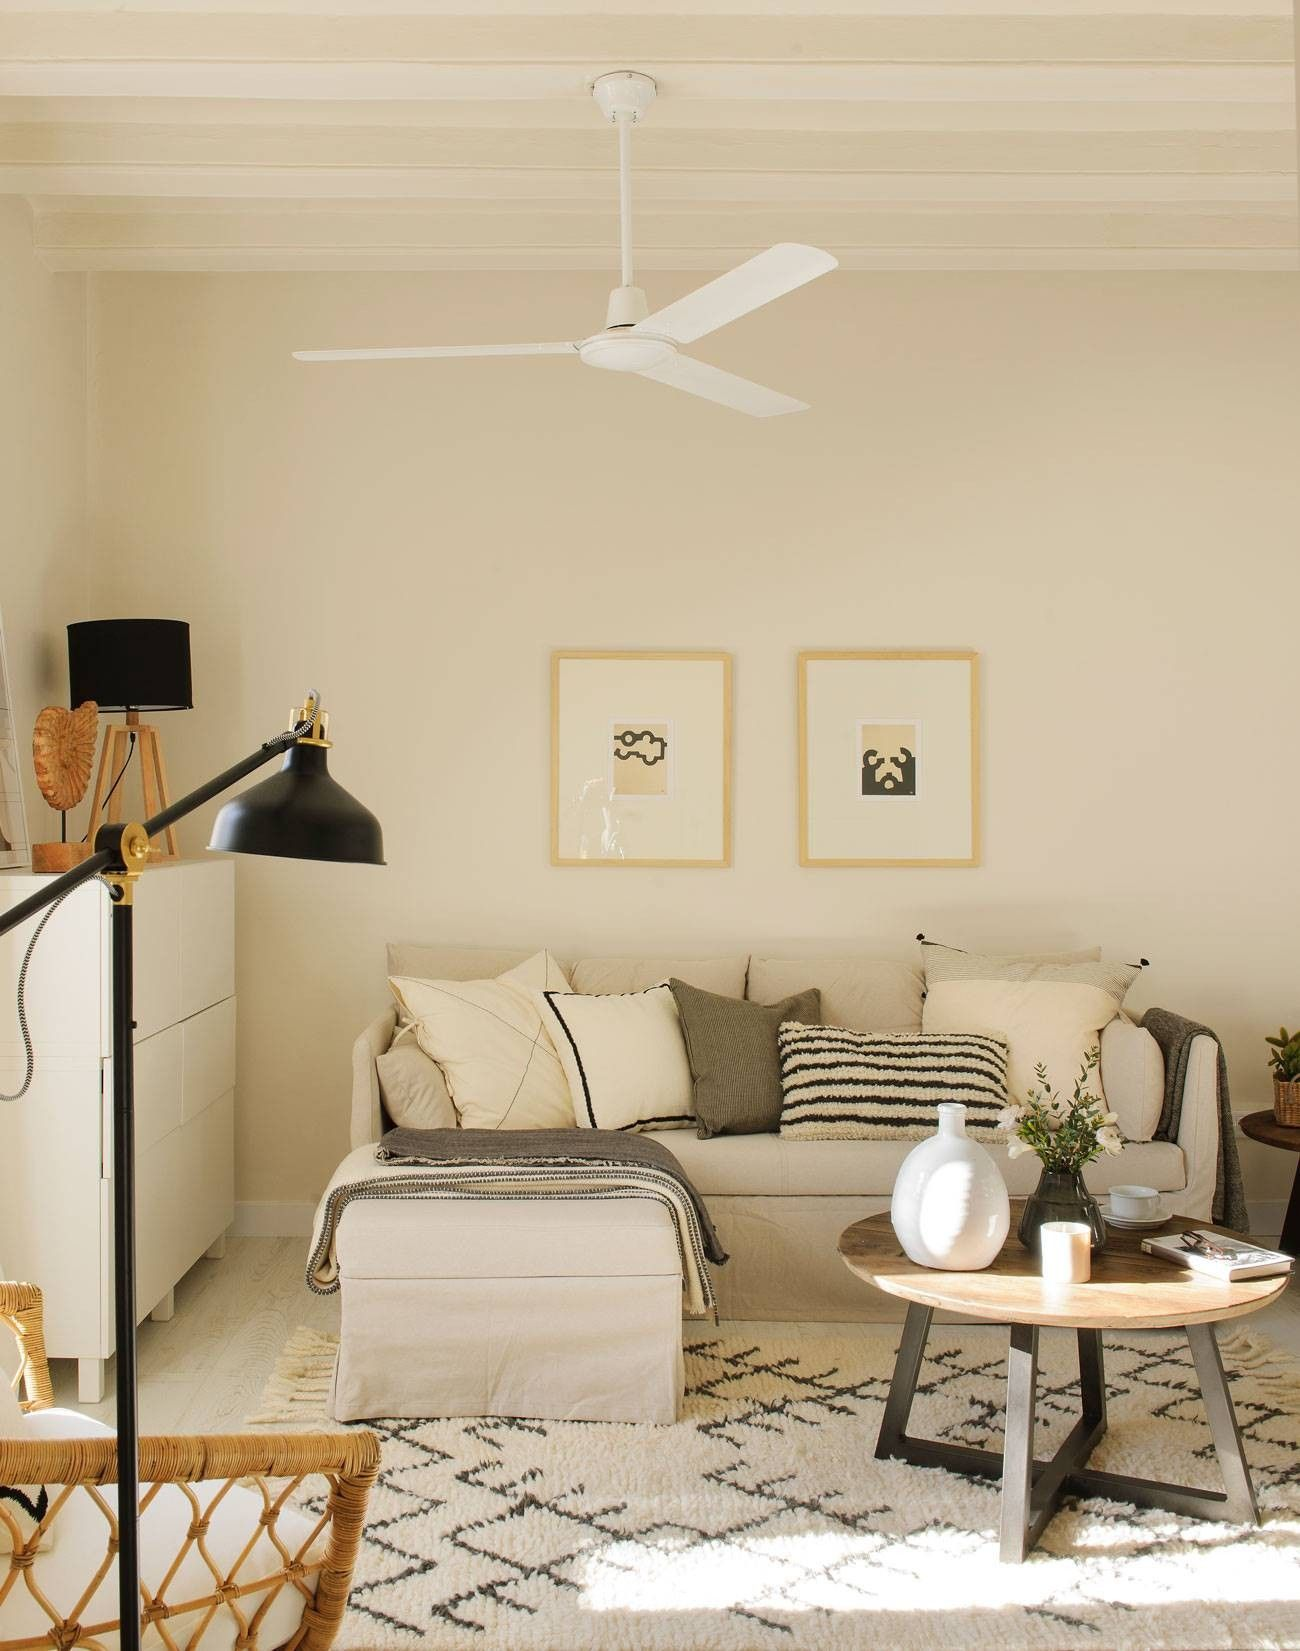 Sofa Sandbacken Ikea Living Room Decor Traditional Living Room Decor Apartment Family Room Layout [ 1651 x 1300 Pixel ]